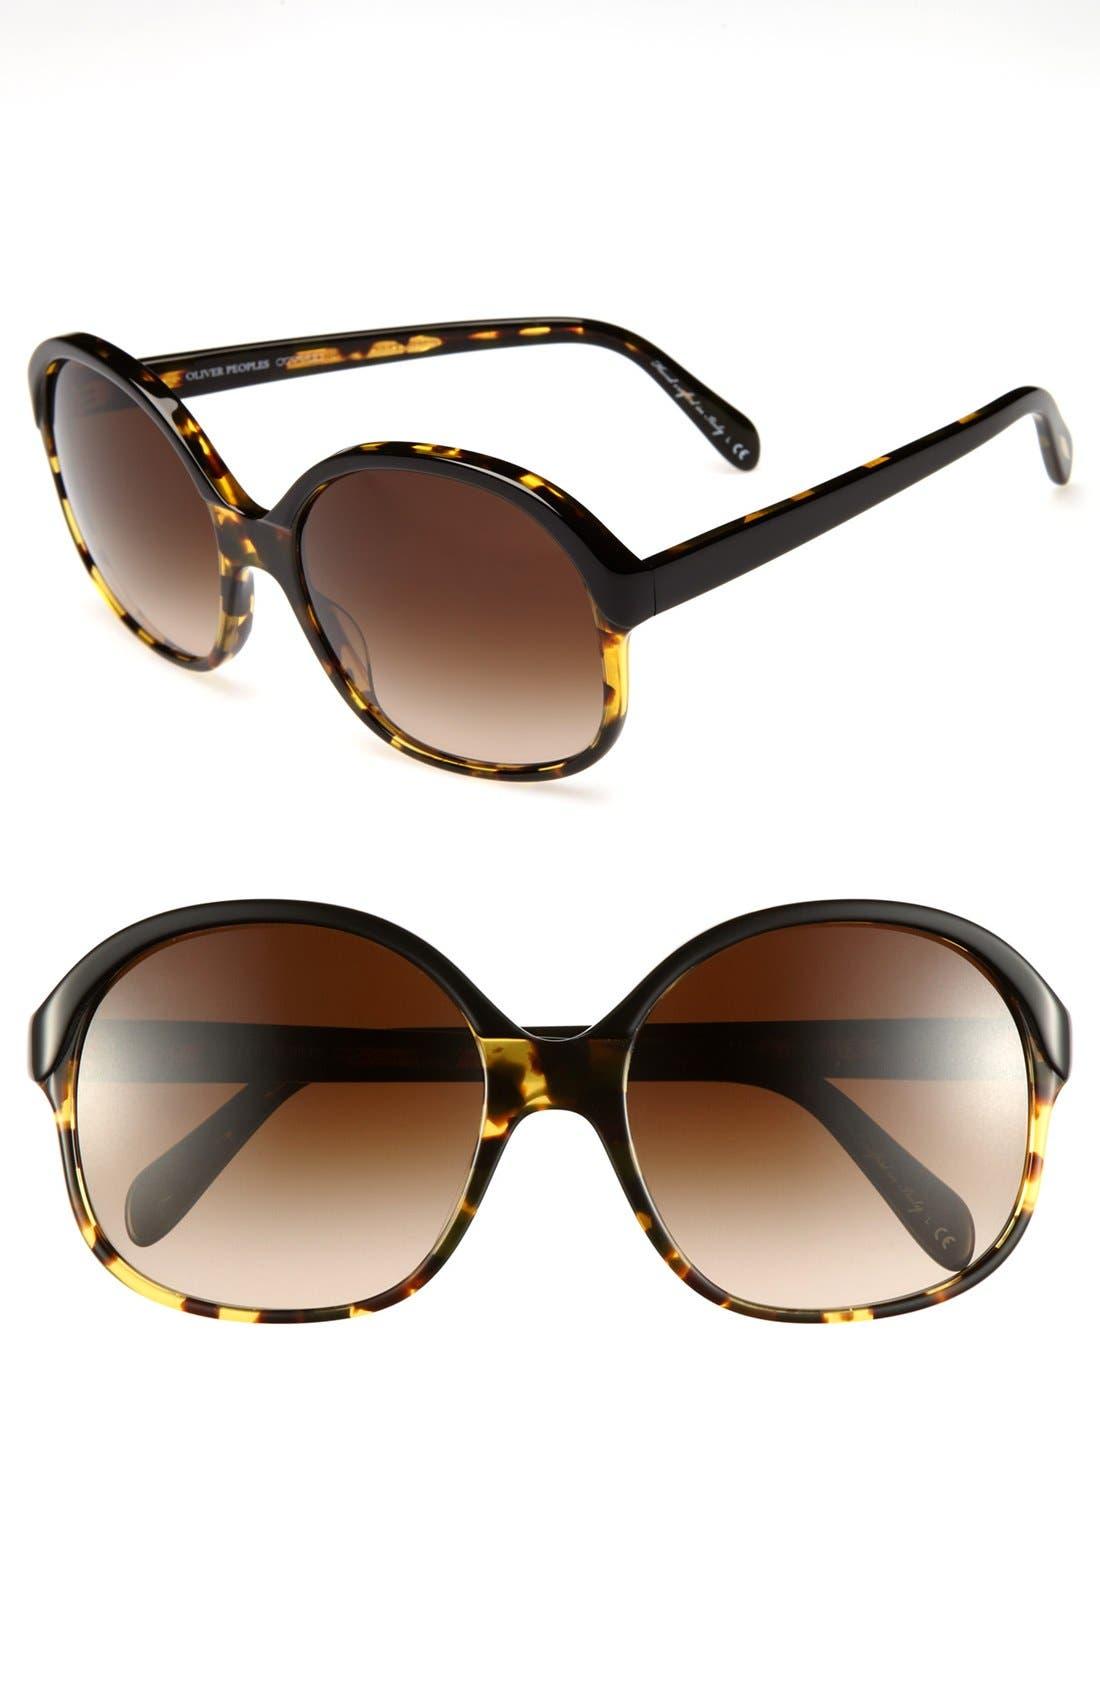 Alternate Image 1 Selected - Oliver Peoples 'Casandra' 61mm Sunglasses